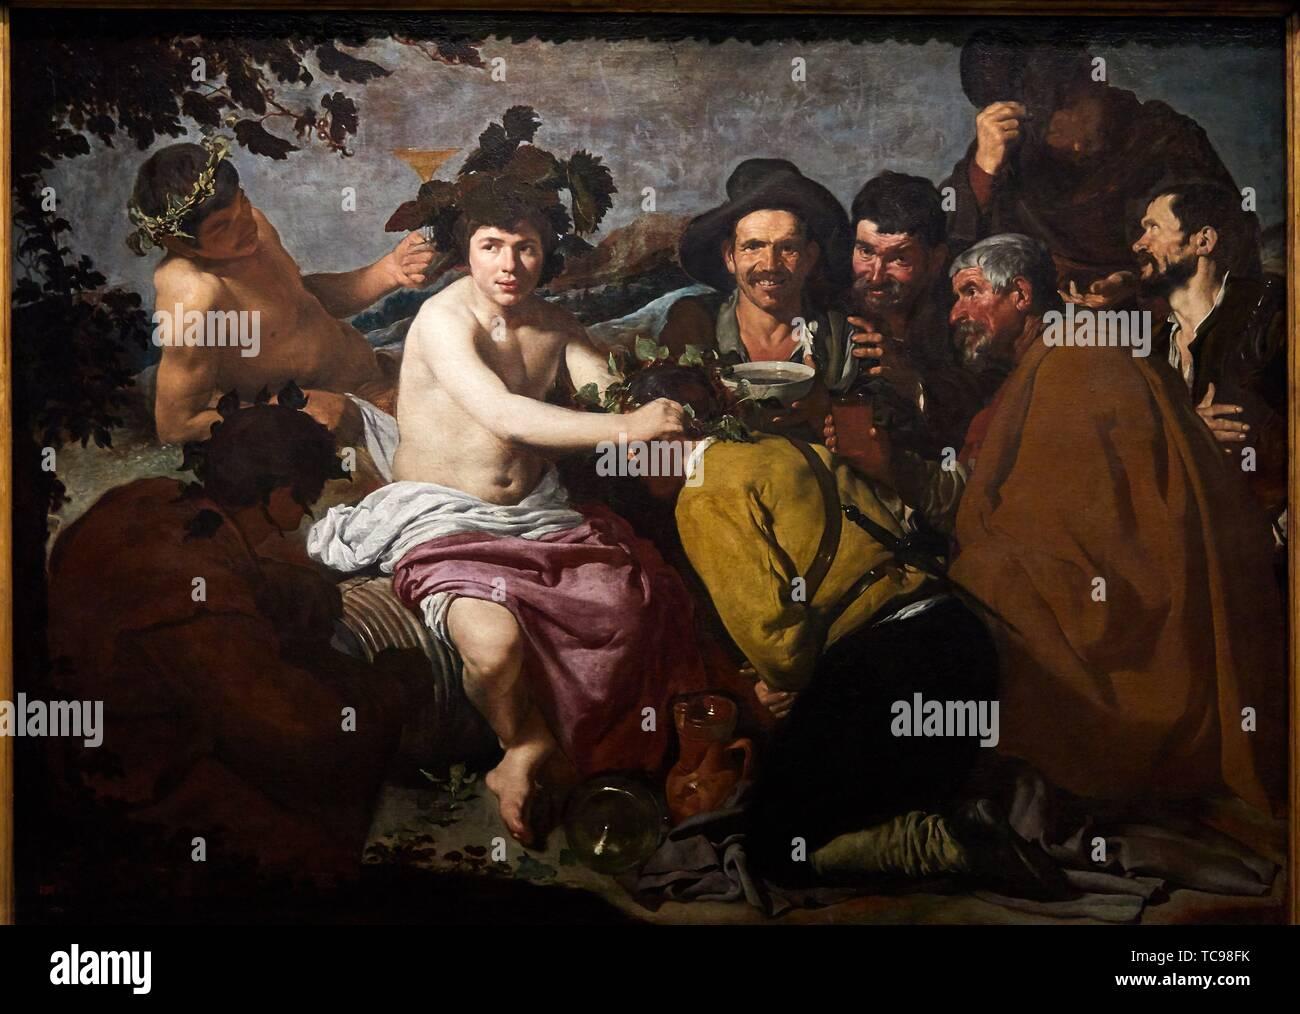 """""""The Feast of Bacchus"""", 1628-1629, Diego Rodriguez de Silva y Velázquez, Prado Museum, Madrid, Spain, Europe Stock Photo"